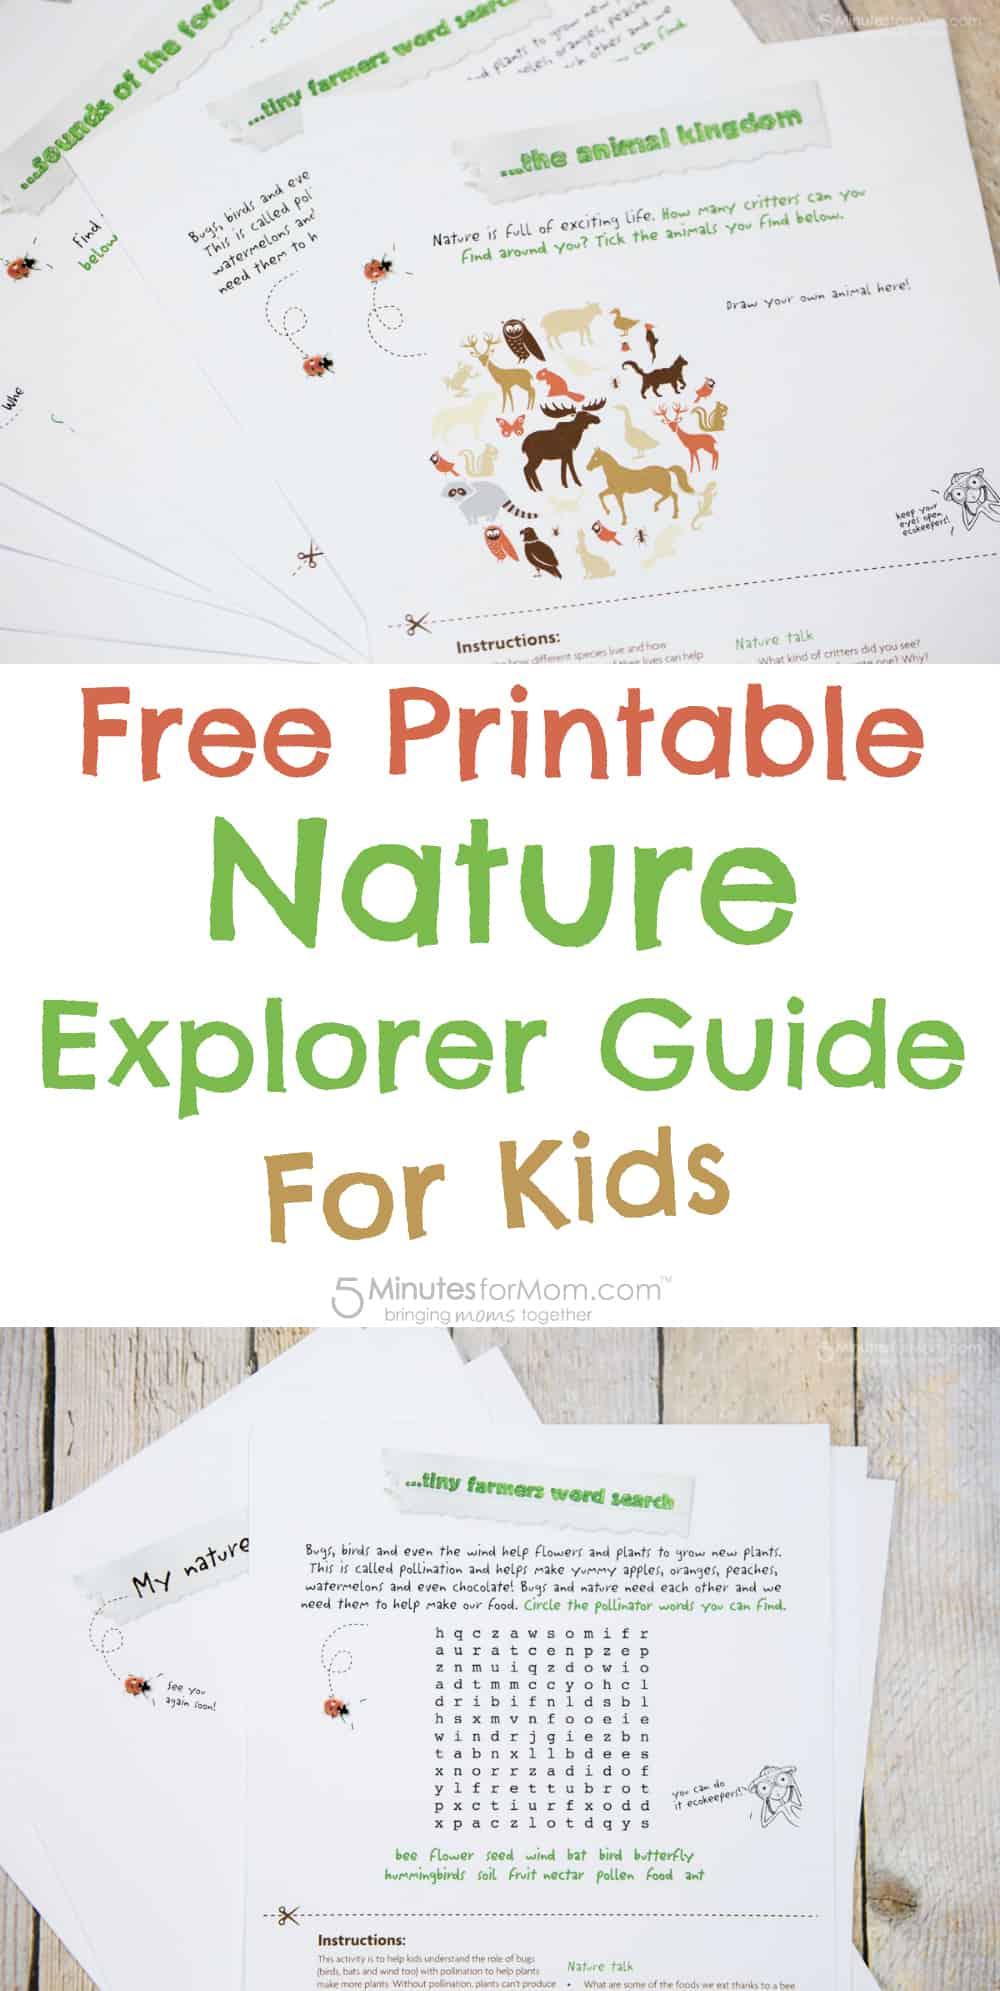 Free printable nature explorer guide for kids